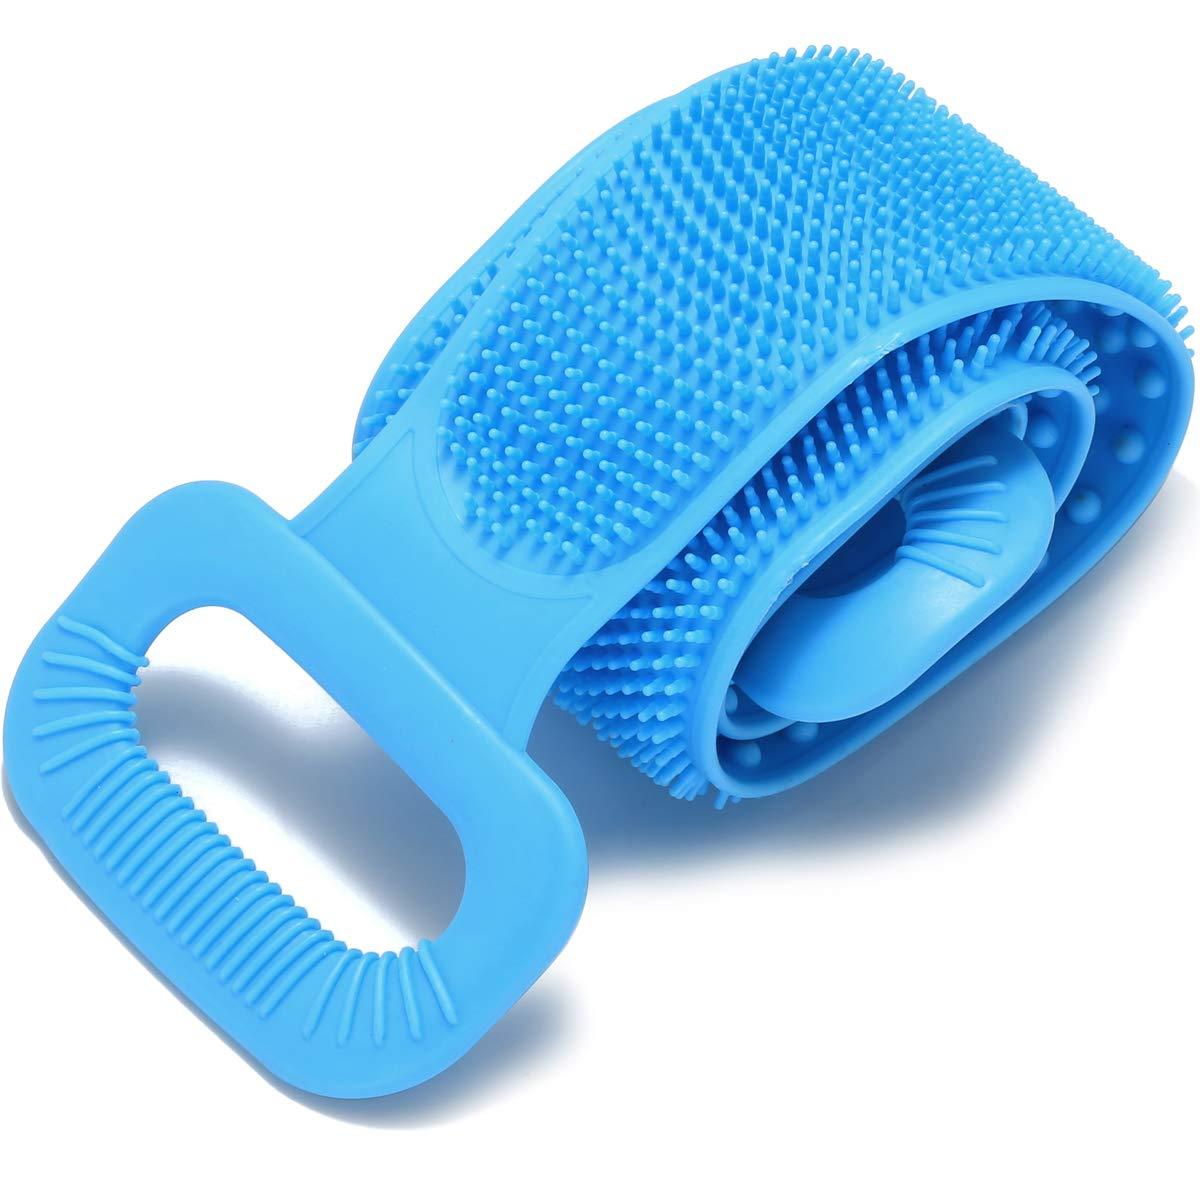 RIVTUN Silicone Bath 5 ☆ very popular Body Brush Back Superior Shower Easy to Scrubber for